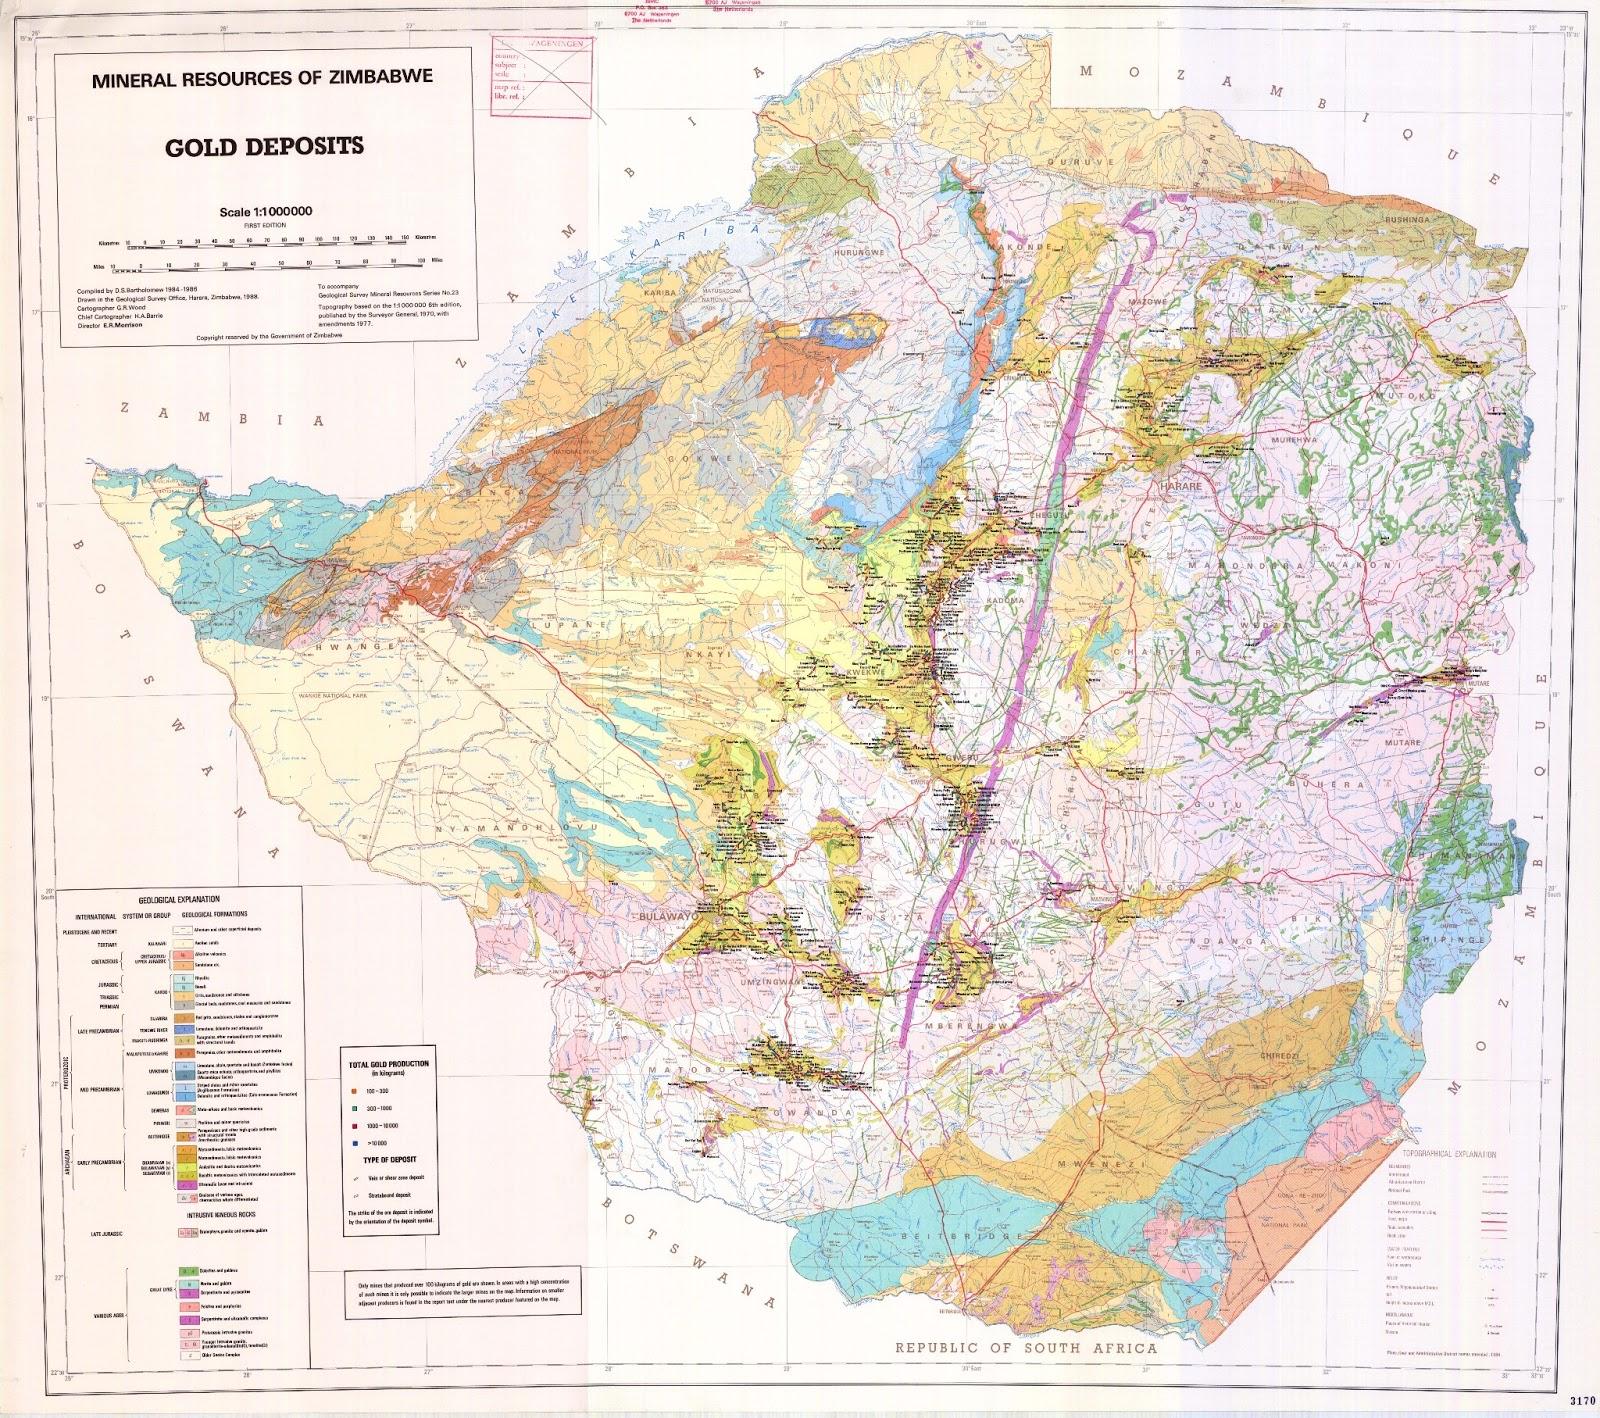 Spilpunt zimbabwe gold deposits gumiabroncs Image collections